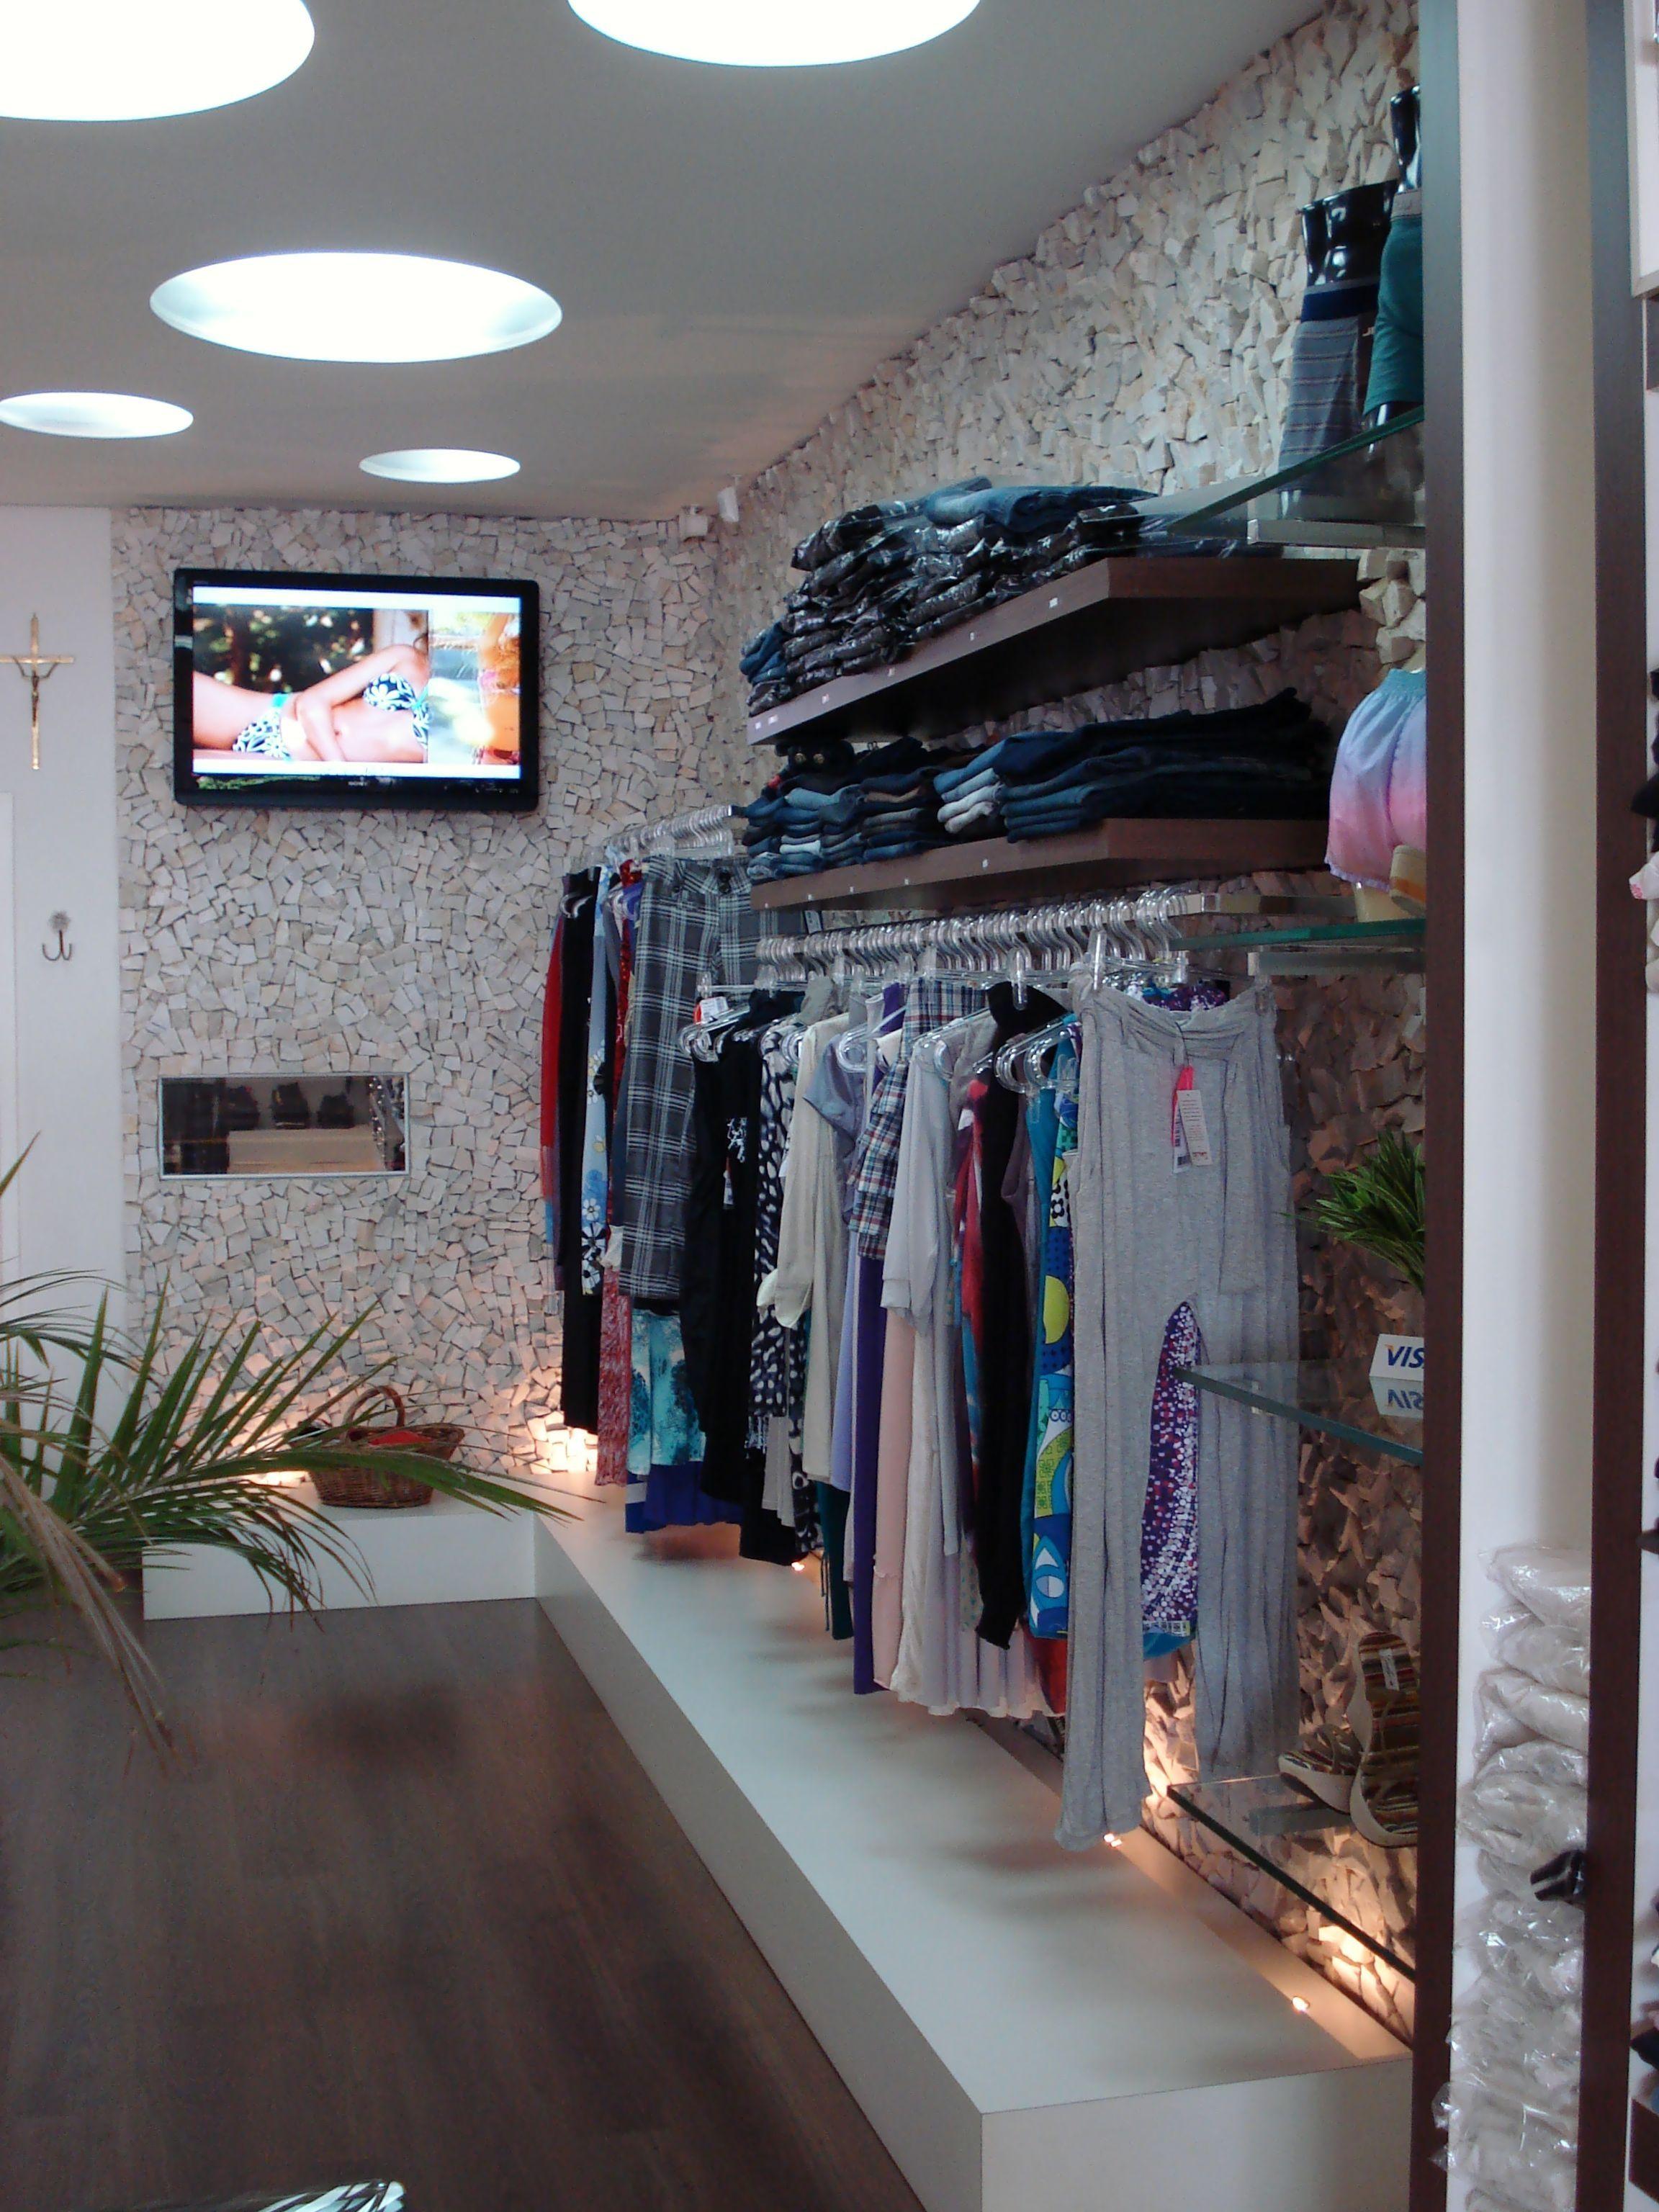 projeto de marcenaria para lojas de roupas pequenas Pesquisa Google Projetos de marcenaria  # Decoracao Para Loja Feminina Pequena